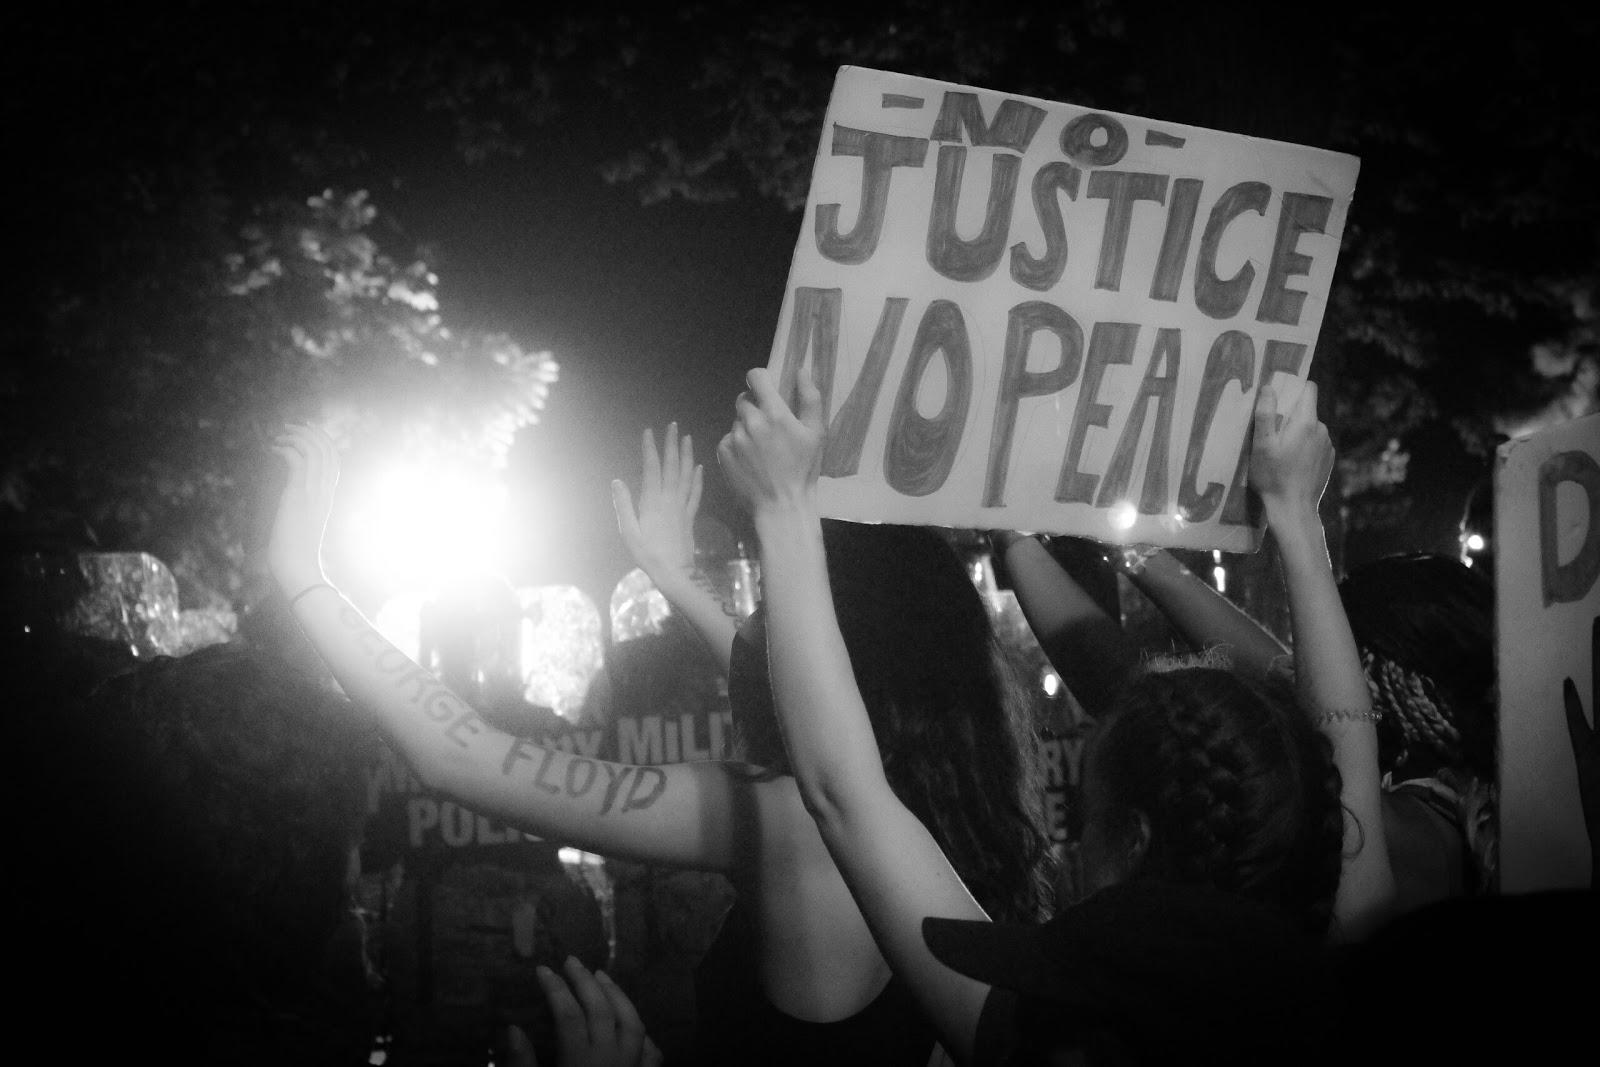 DC police protest